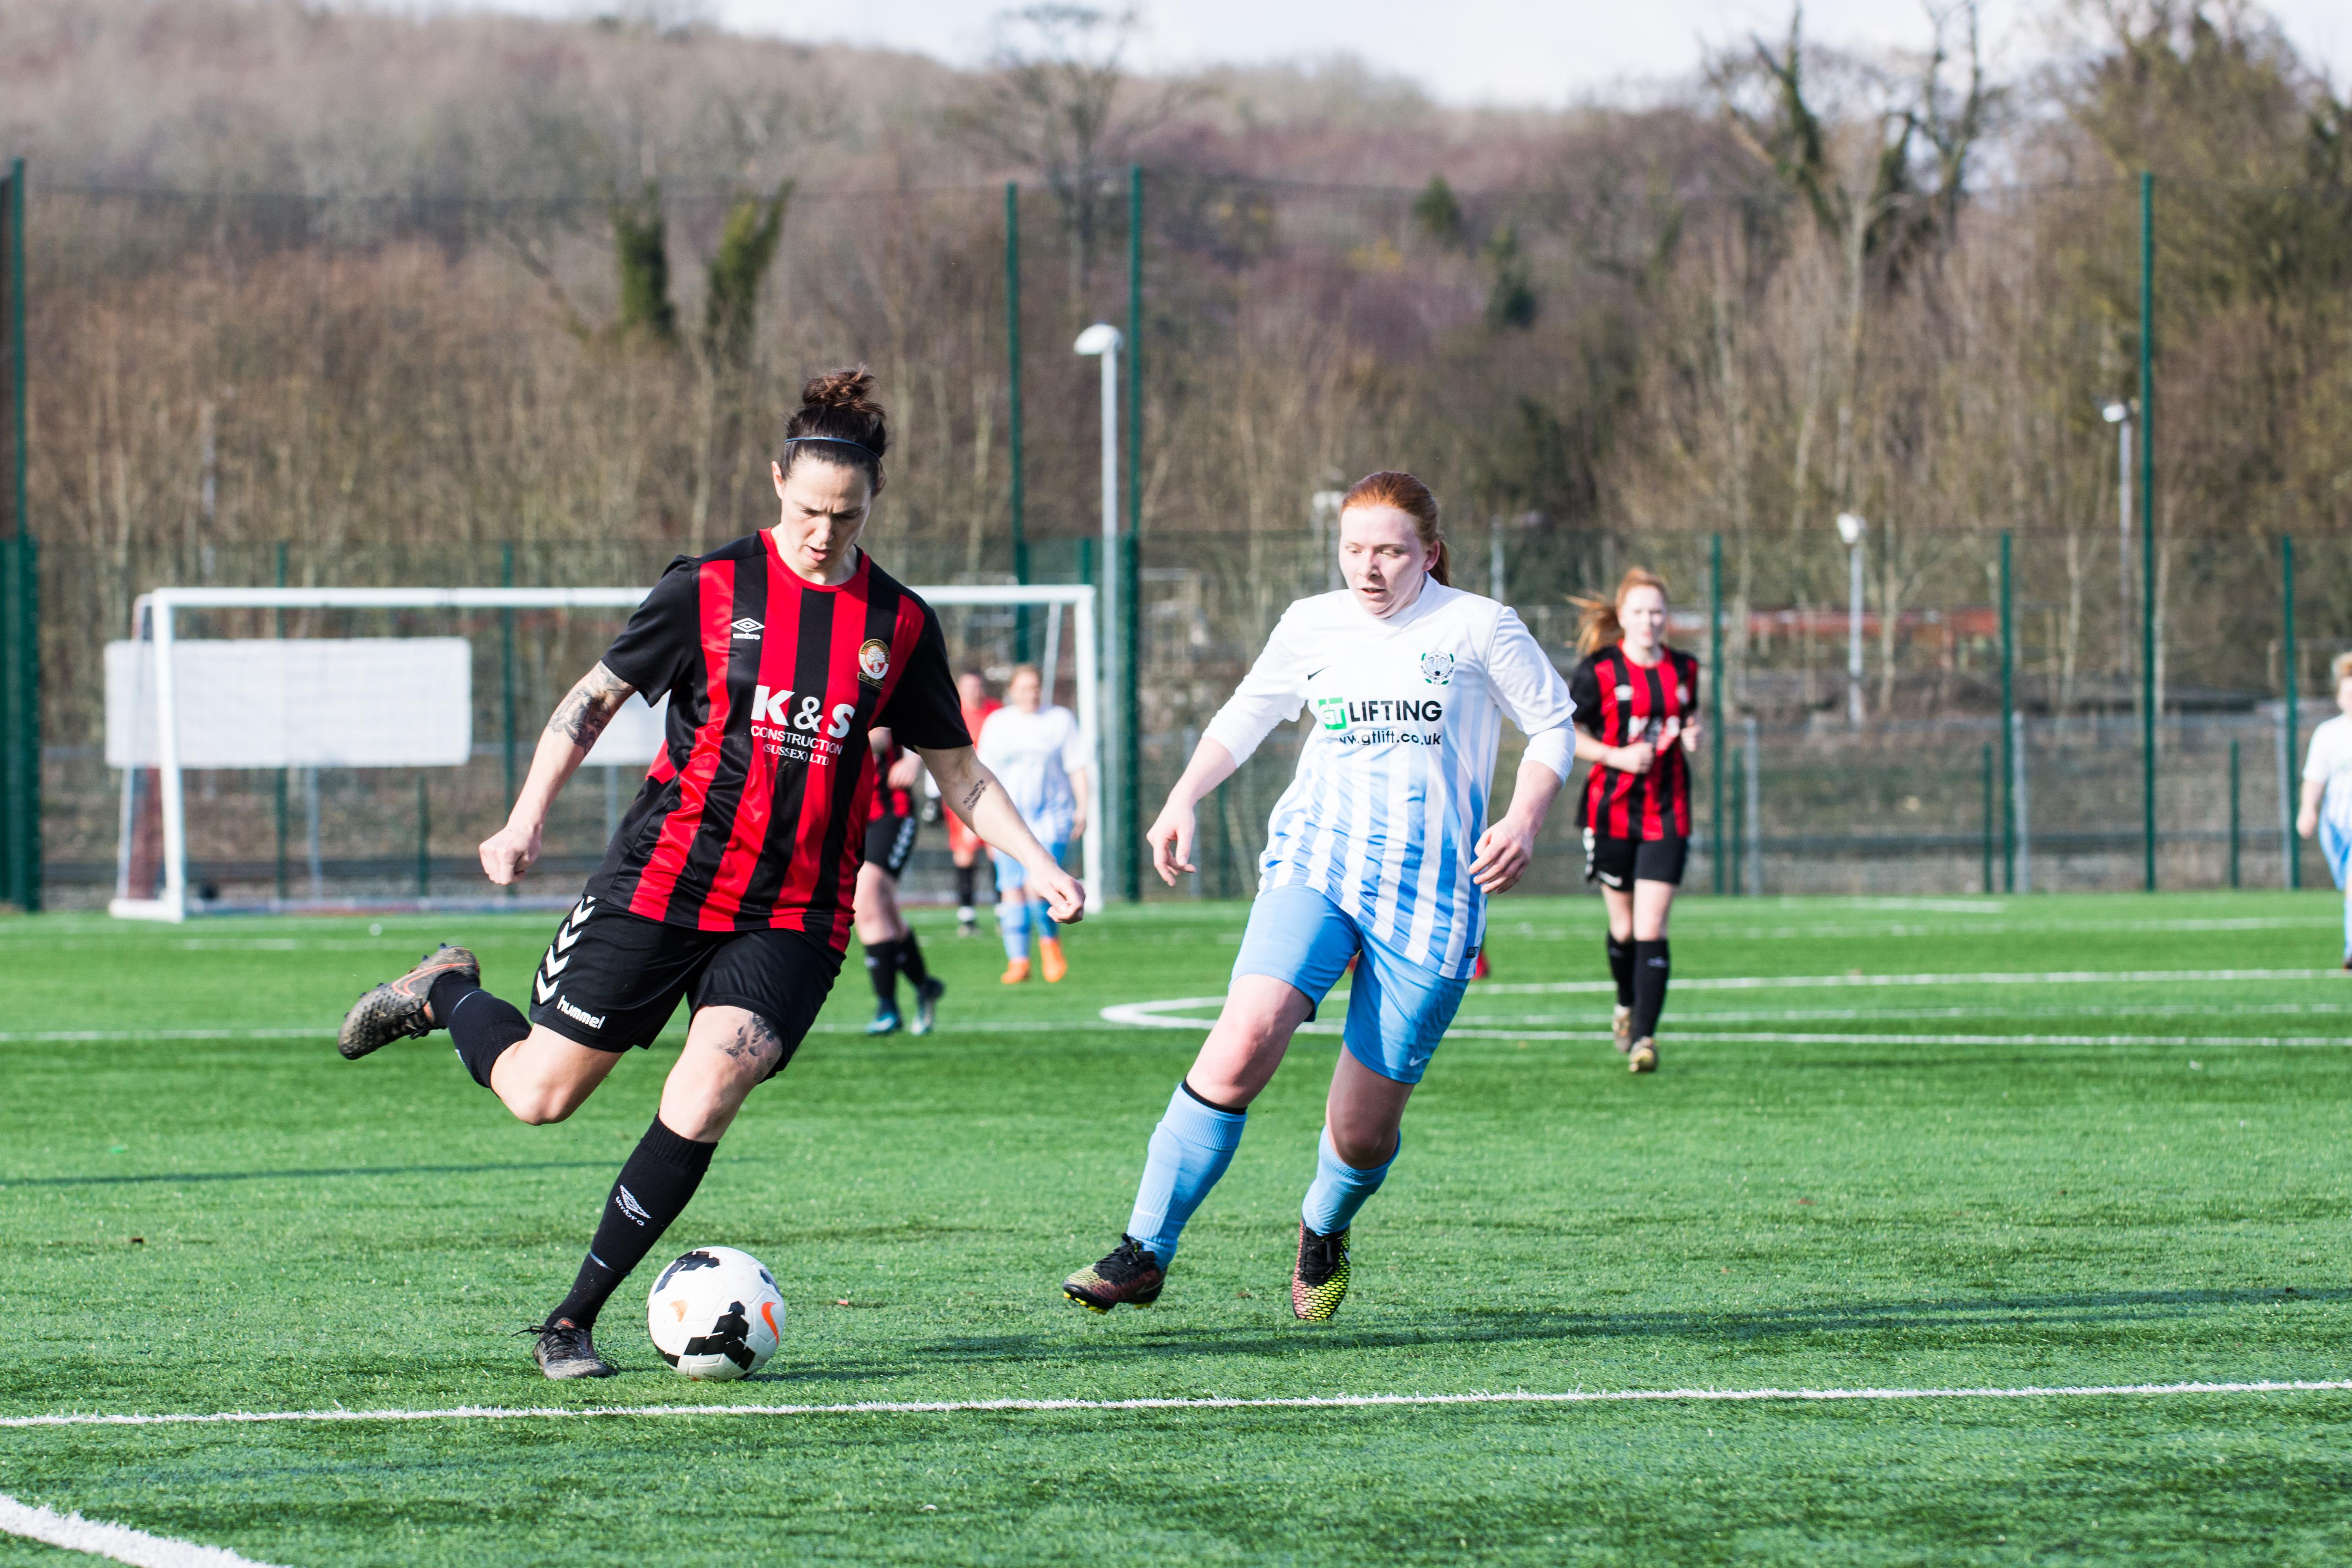 DAVID_JEFFERY Saltdean Utd Ladies FC vs Worthing Utd Ladies FC 11.03.18 26